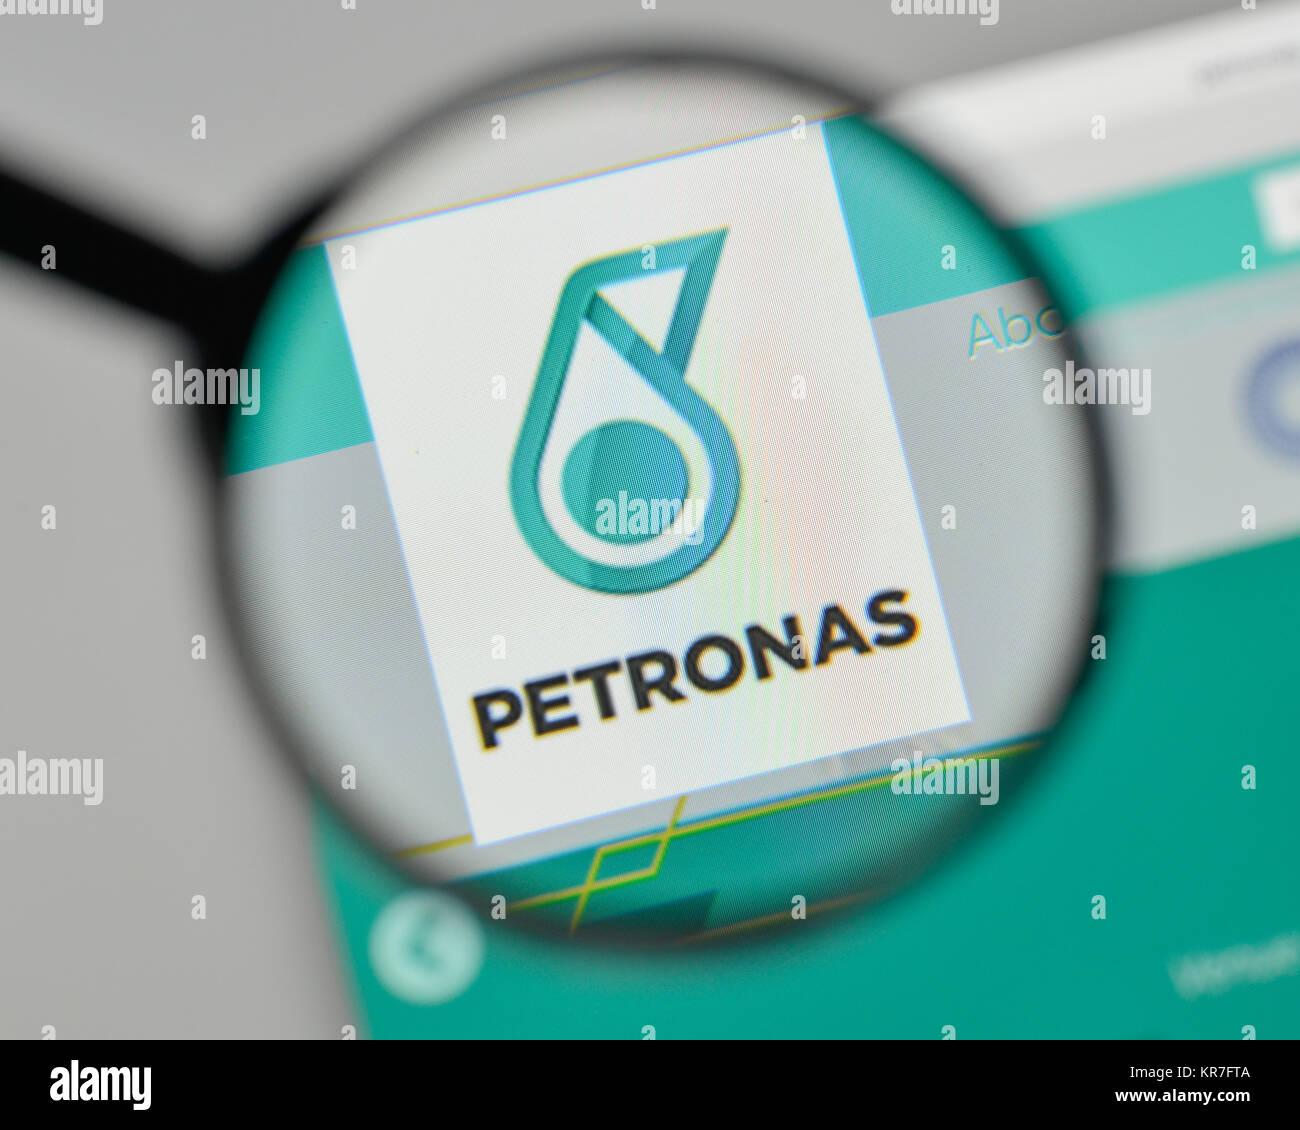 Petronas logo stock photos petronas logo stock images alamy milan italy november 1 2017 petronas logo on the website homepage buycottarizona Gallery